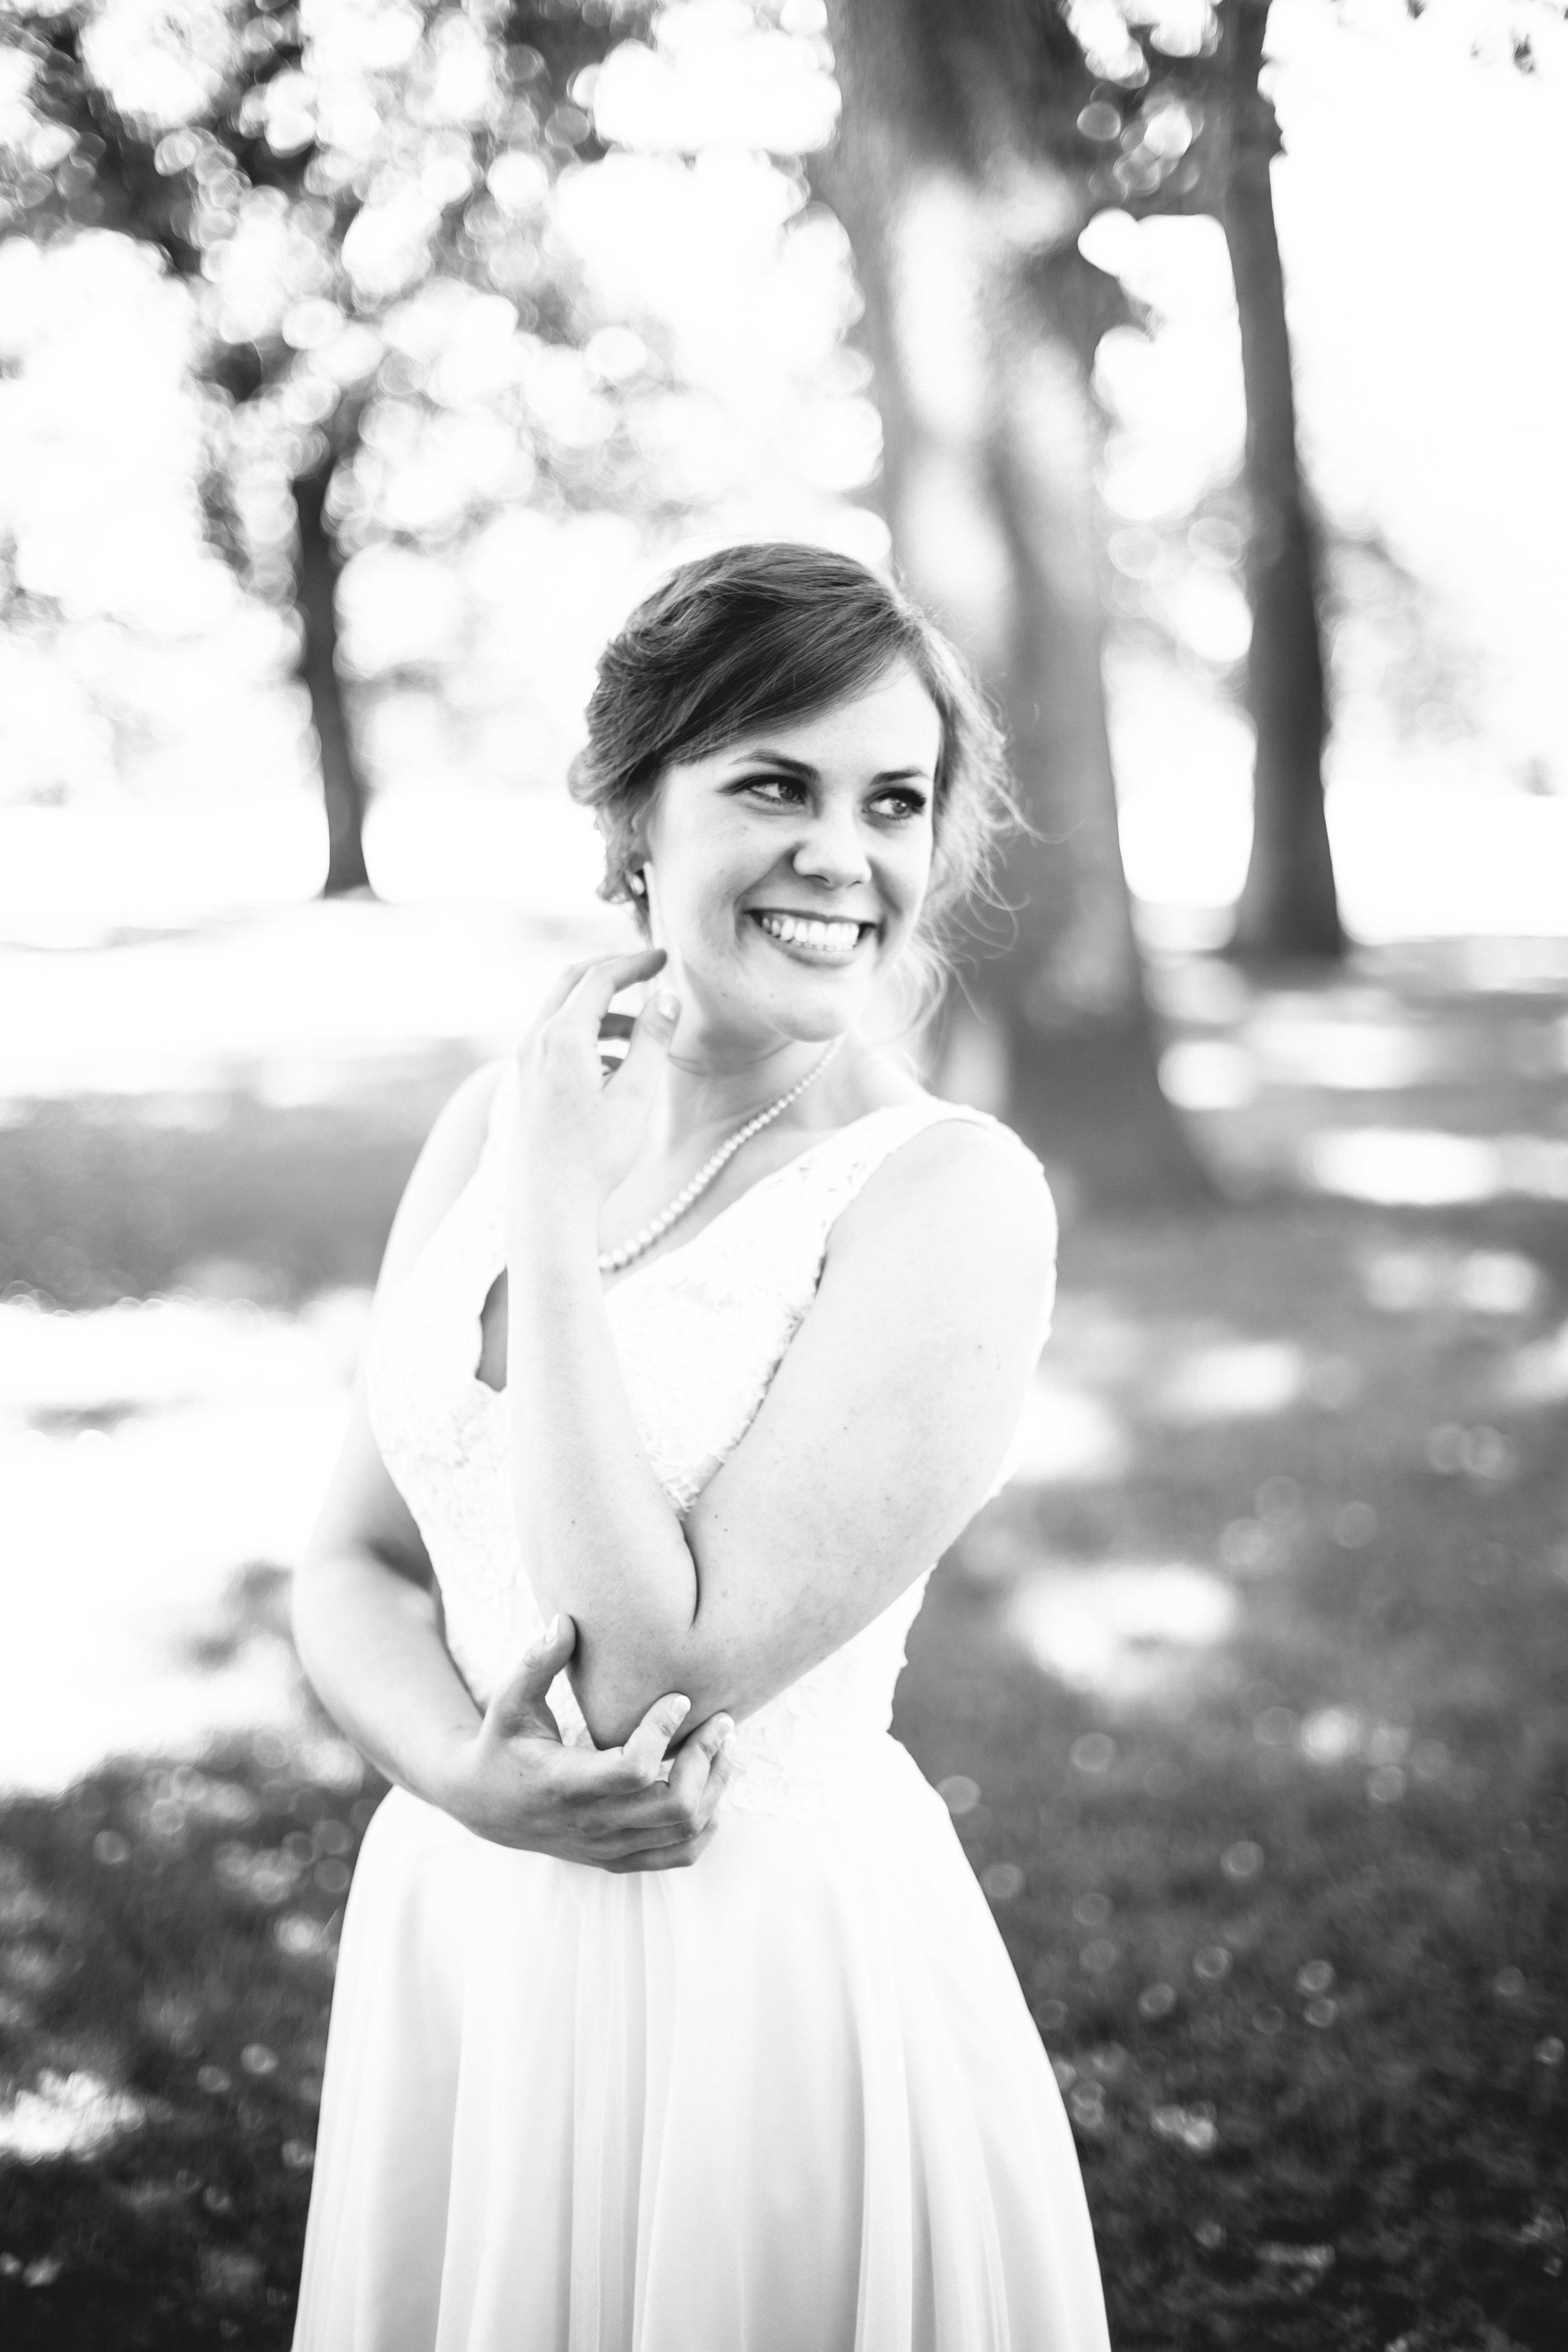 Jordan & Shantel Married - Idaho - Corrie Mick Photography-94.jpg